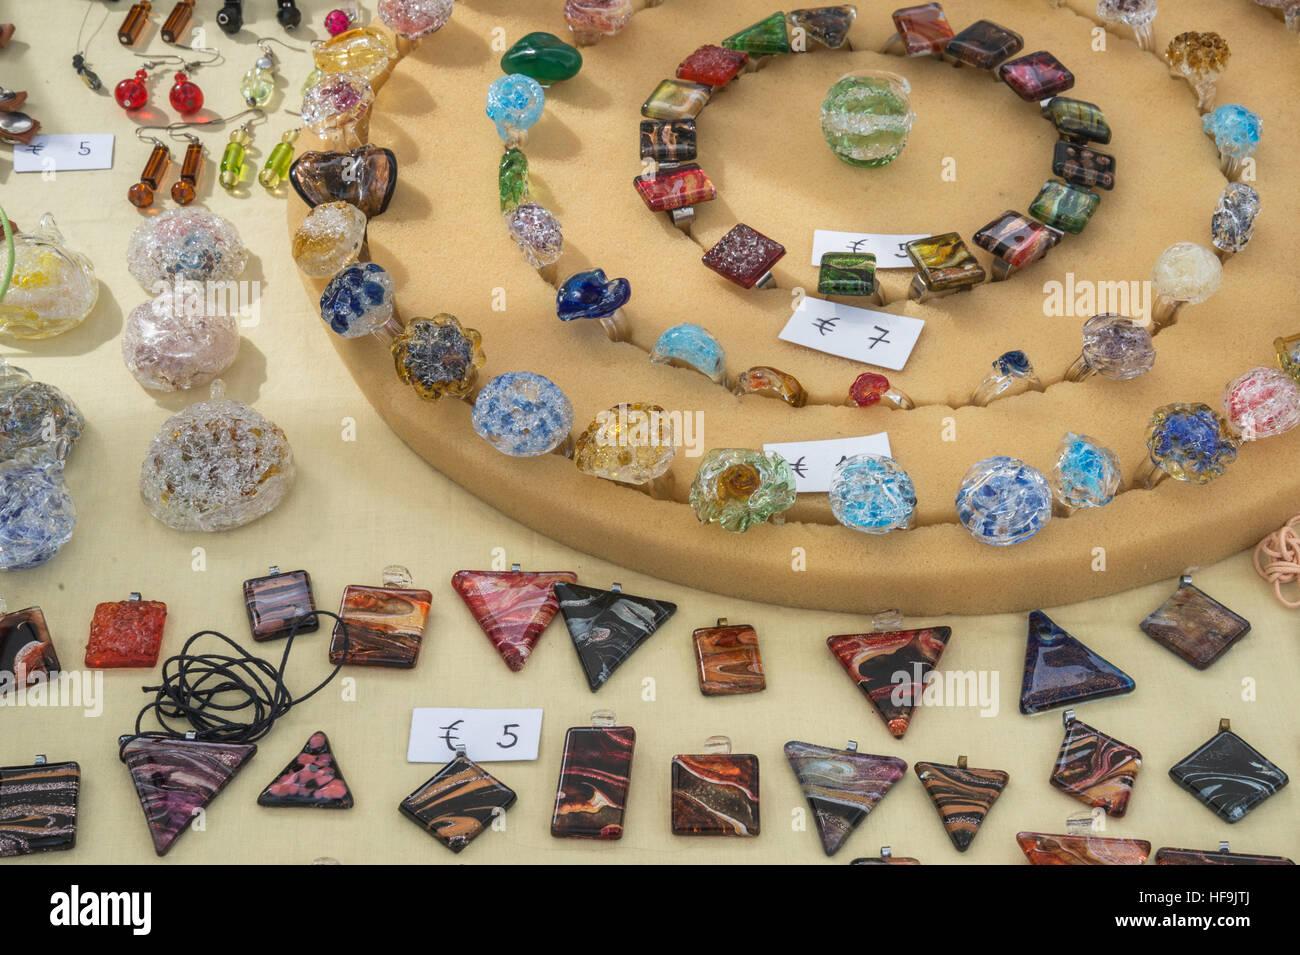 Joyería de vidrio, Palermo, Sicilia, Italia, Europa Imagen De Stock